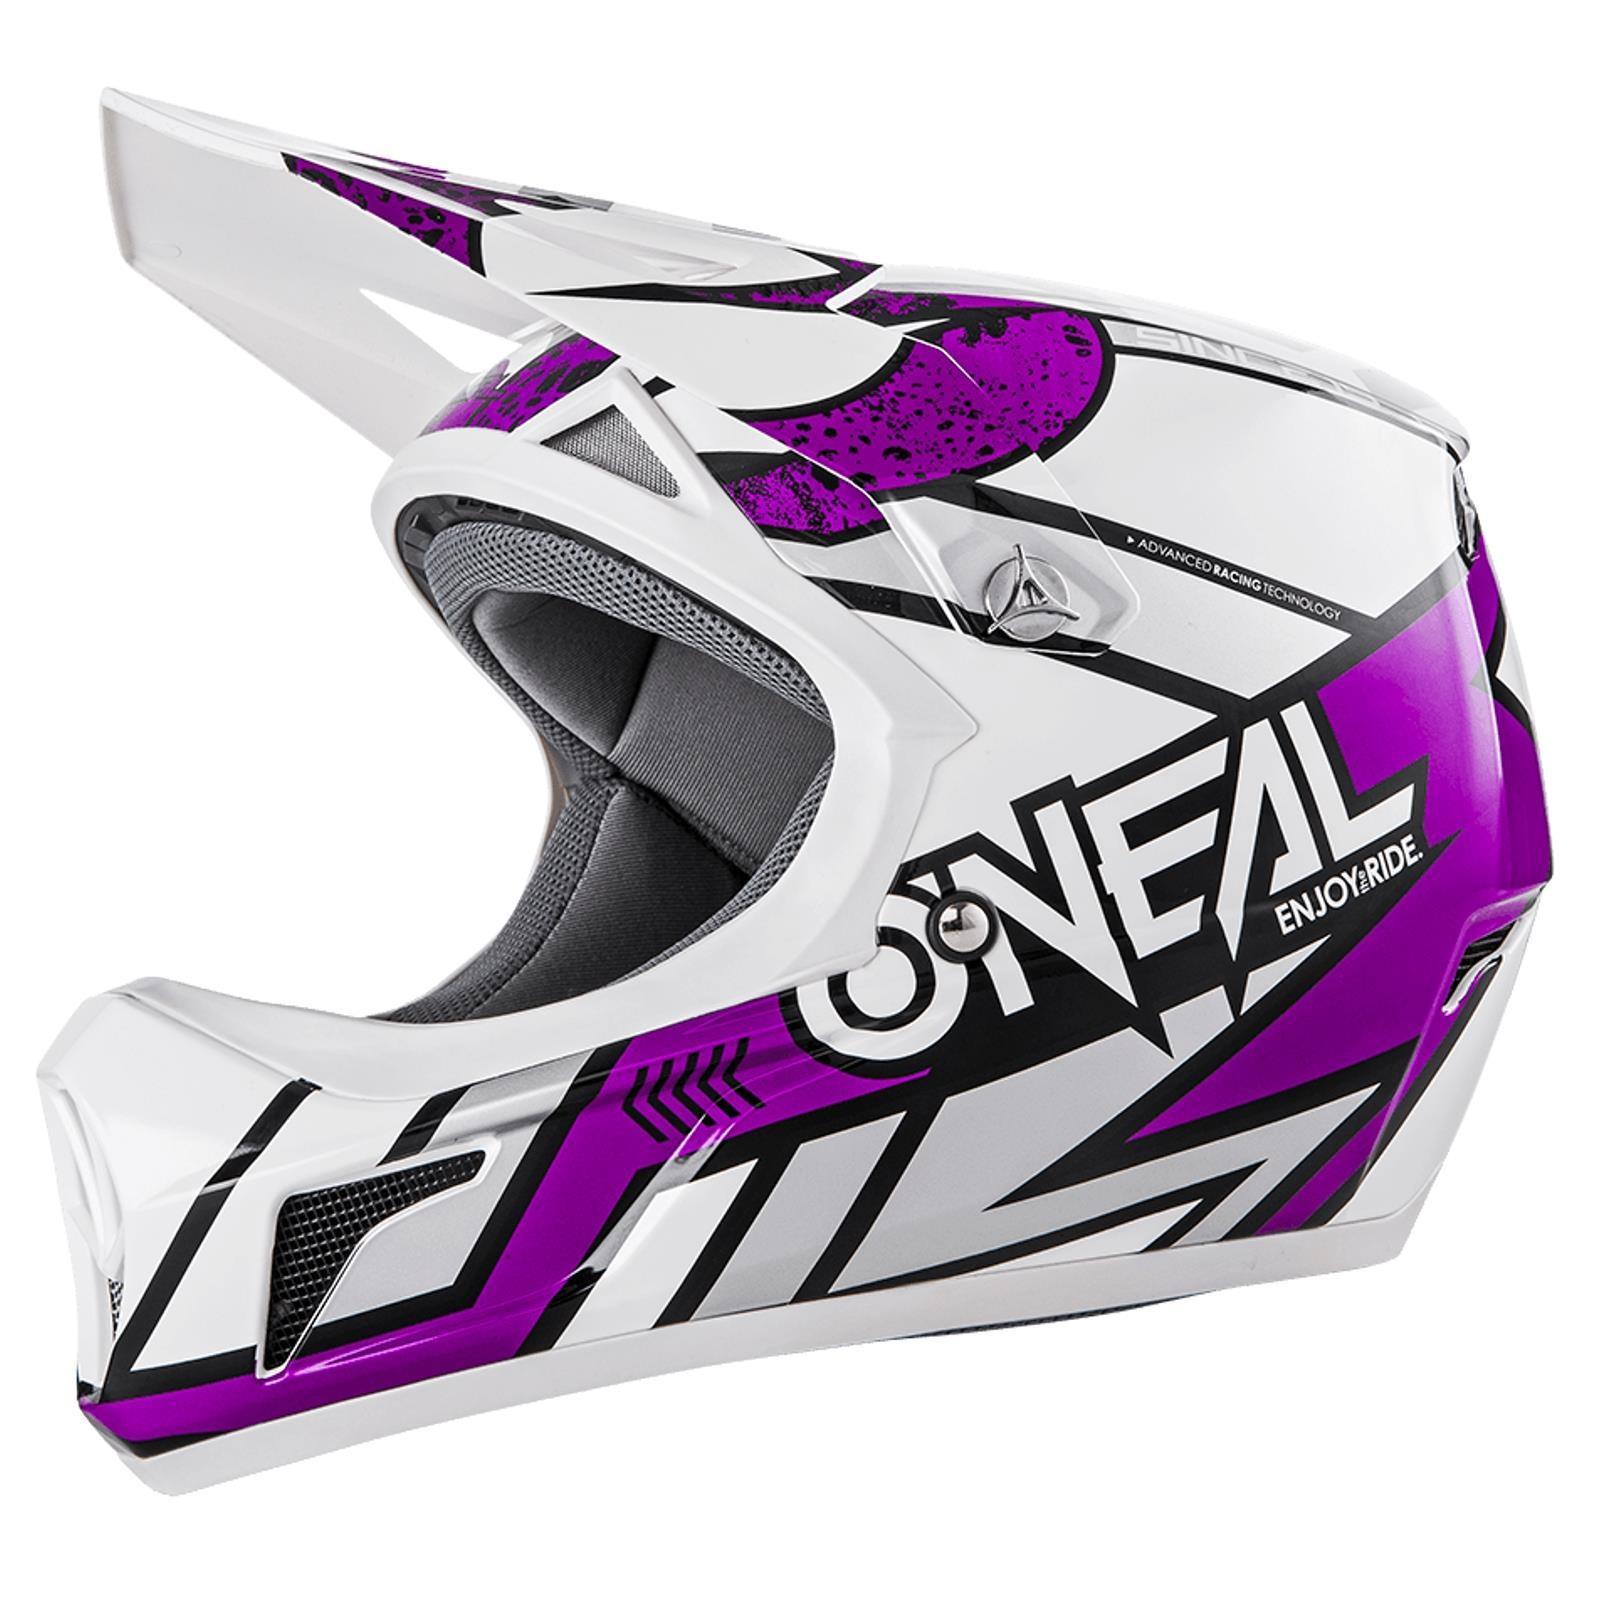 Indexbild 24 - ONeal-Sonus-Strike-Fahrrad-Helm-All-Mountain-Bike-MTB-Downhill-Fullface-Fidlock